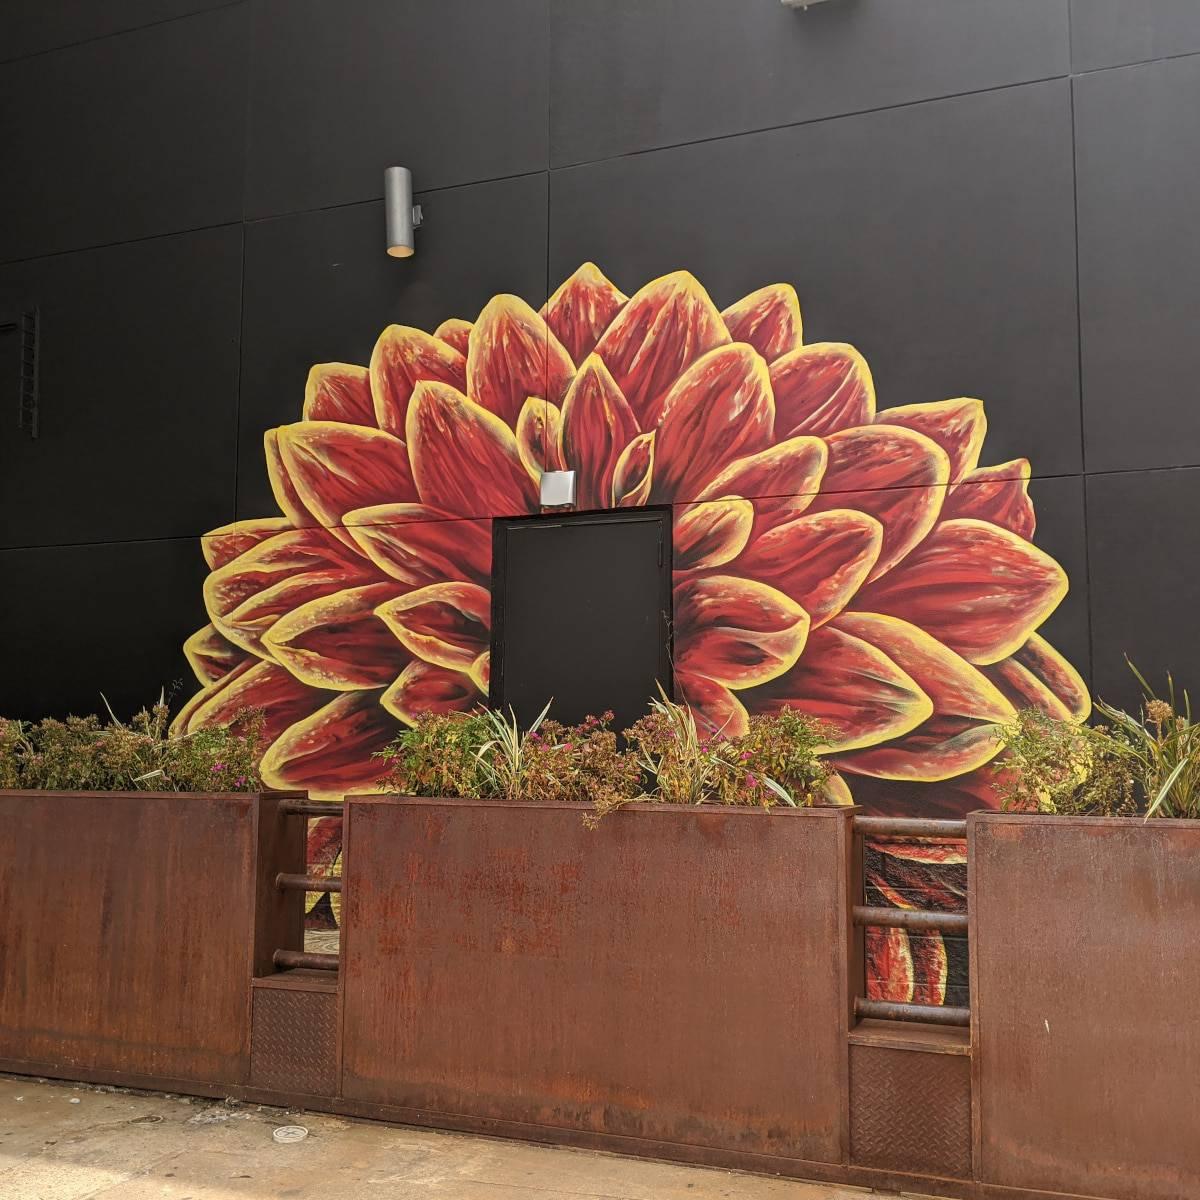 DahliaHTX Mural